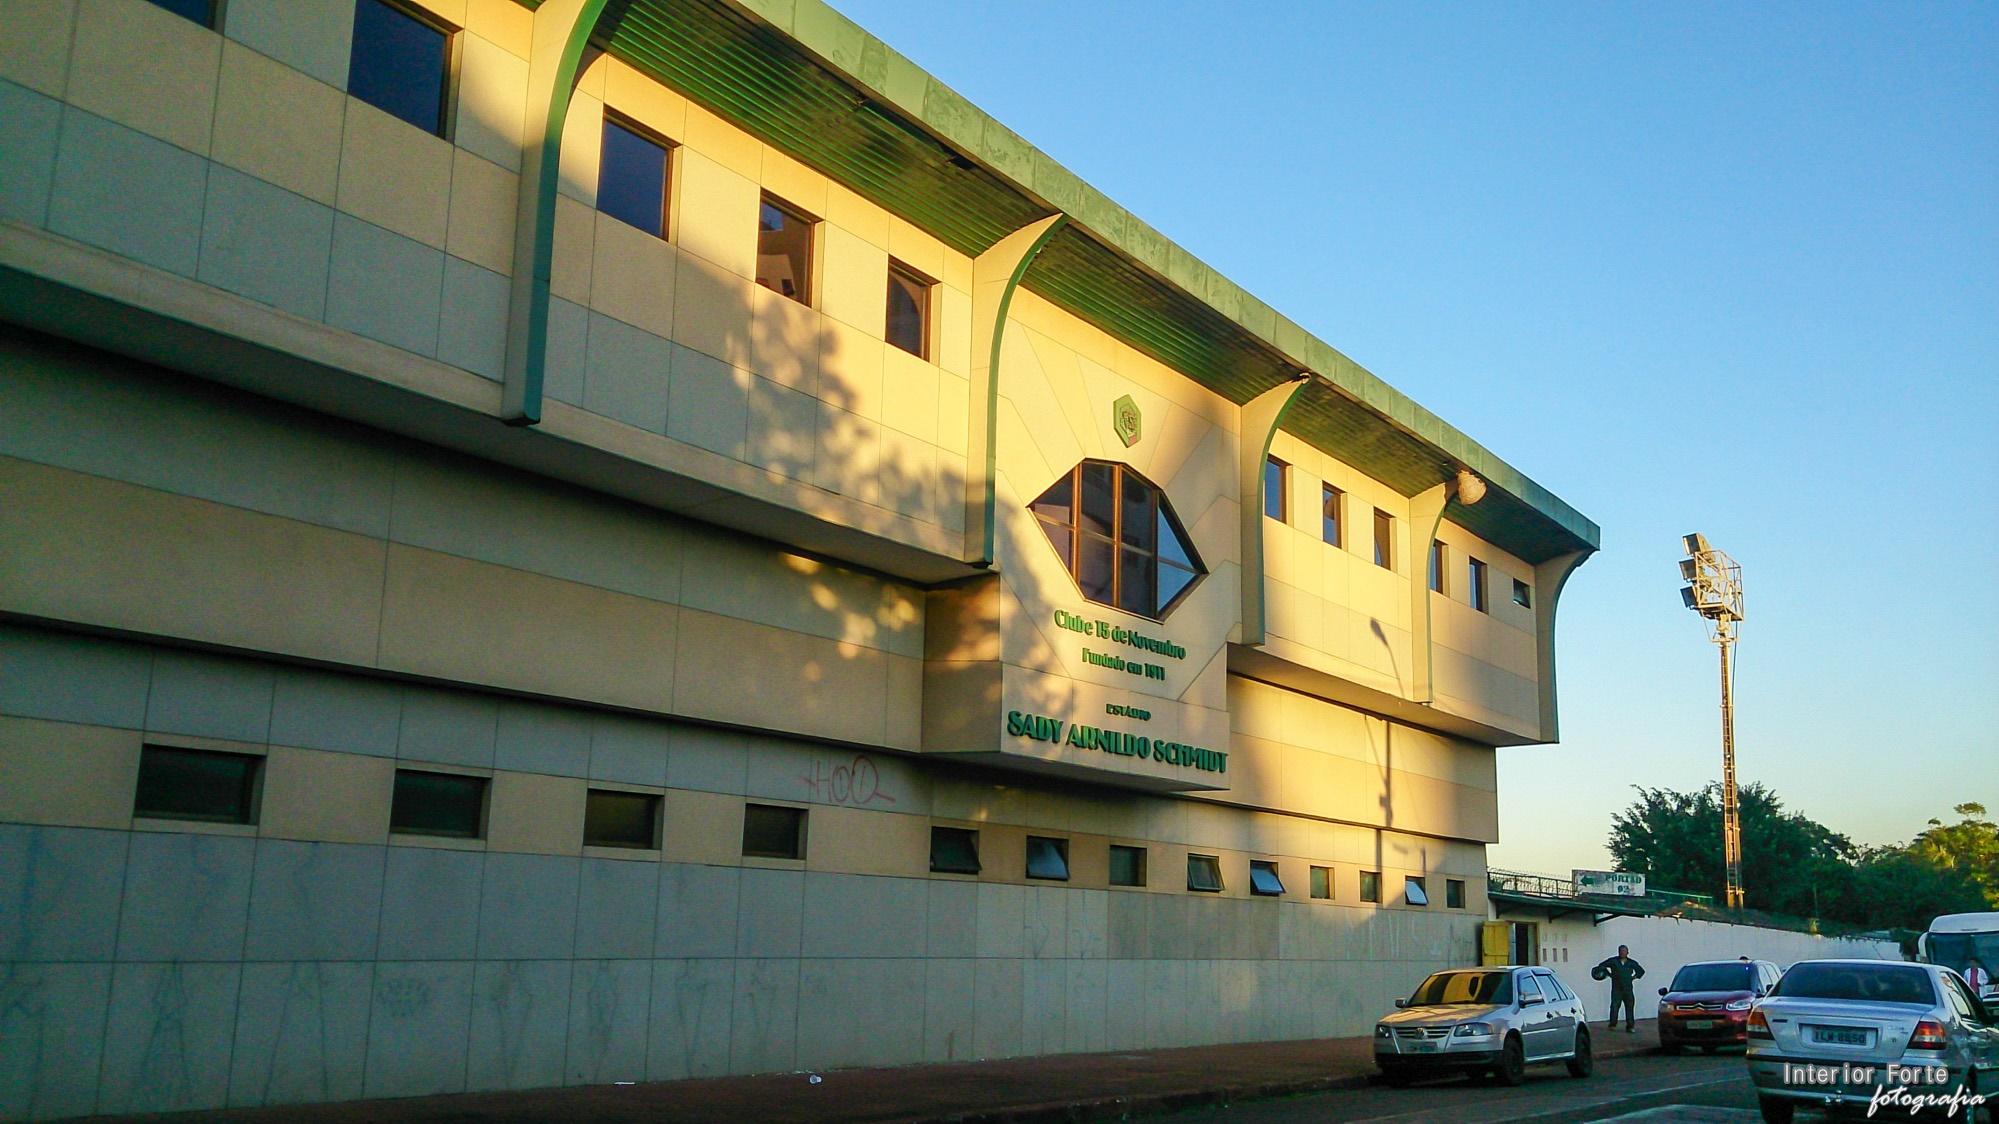 Estádio Sady Arnildo Schmidt